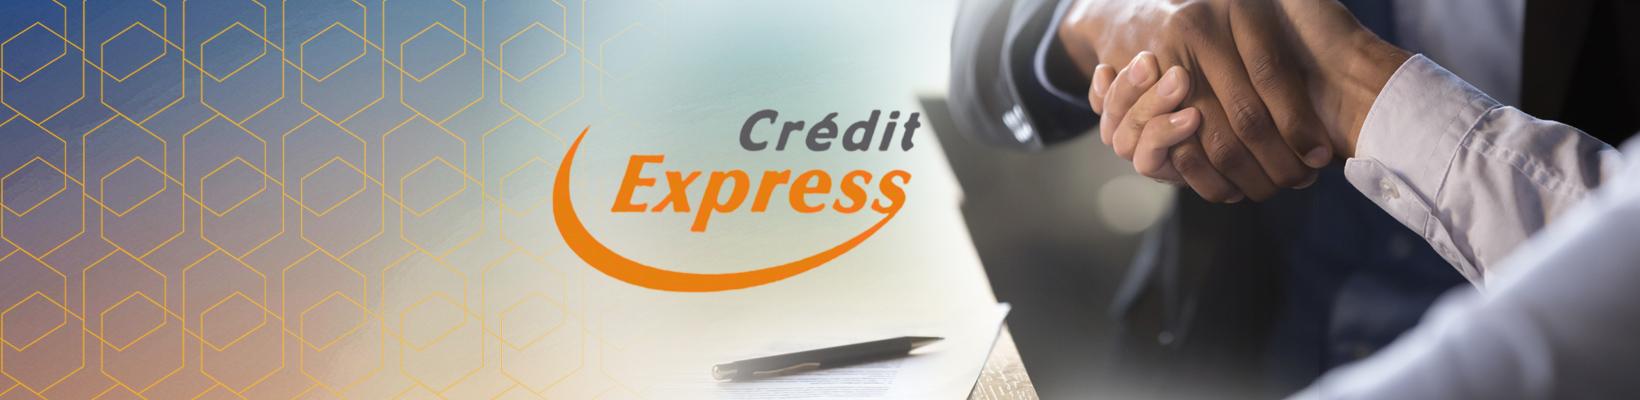 1640x400-crdit-express